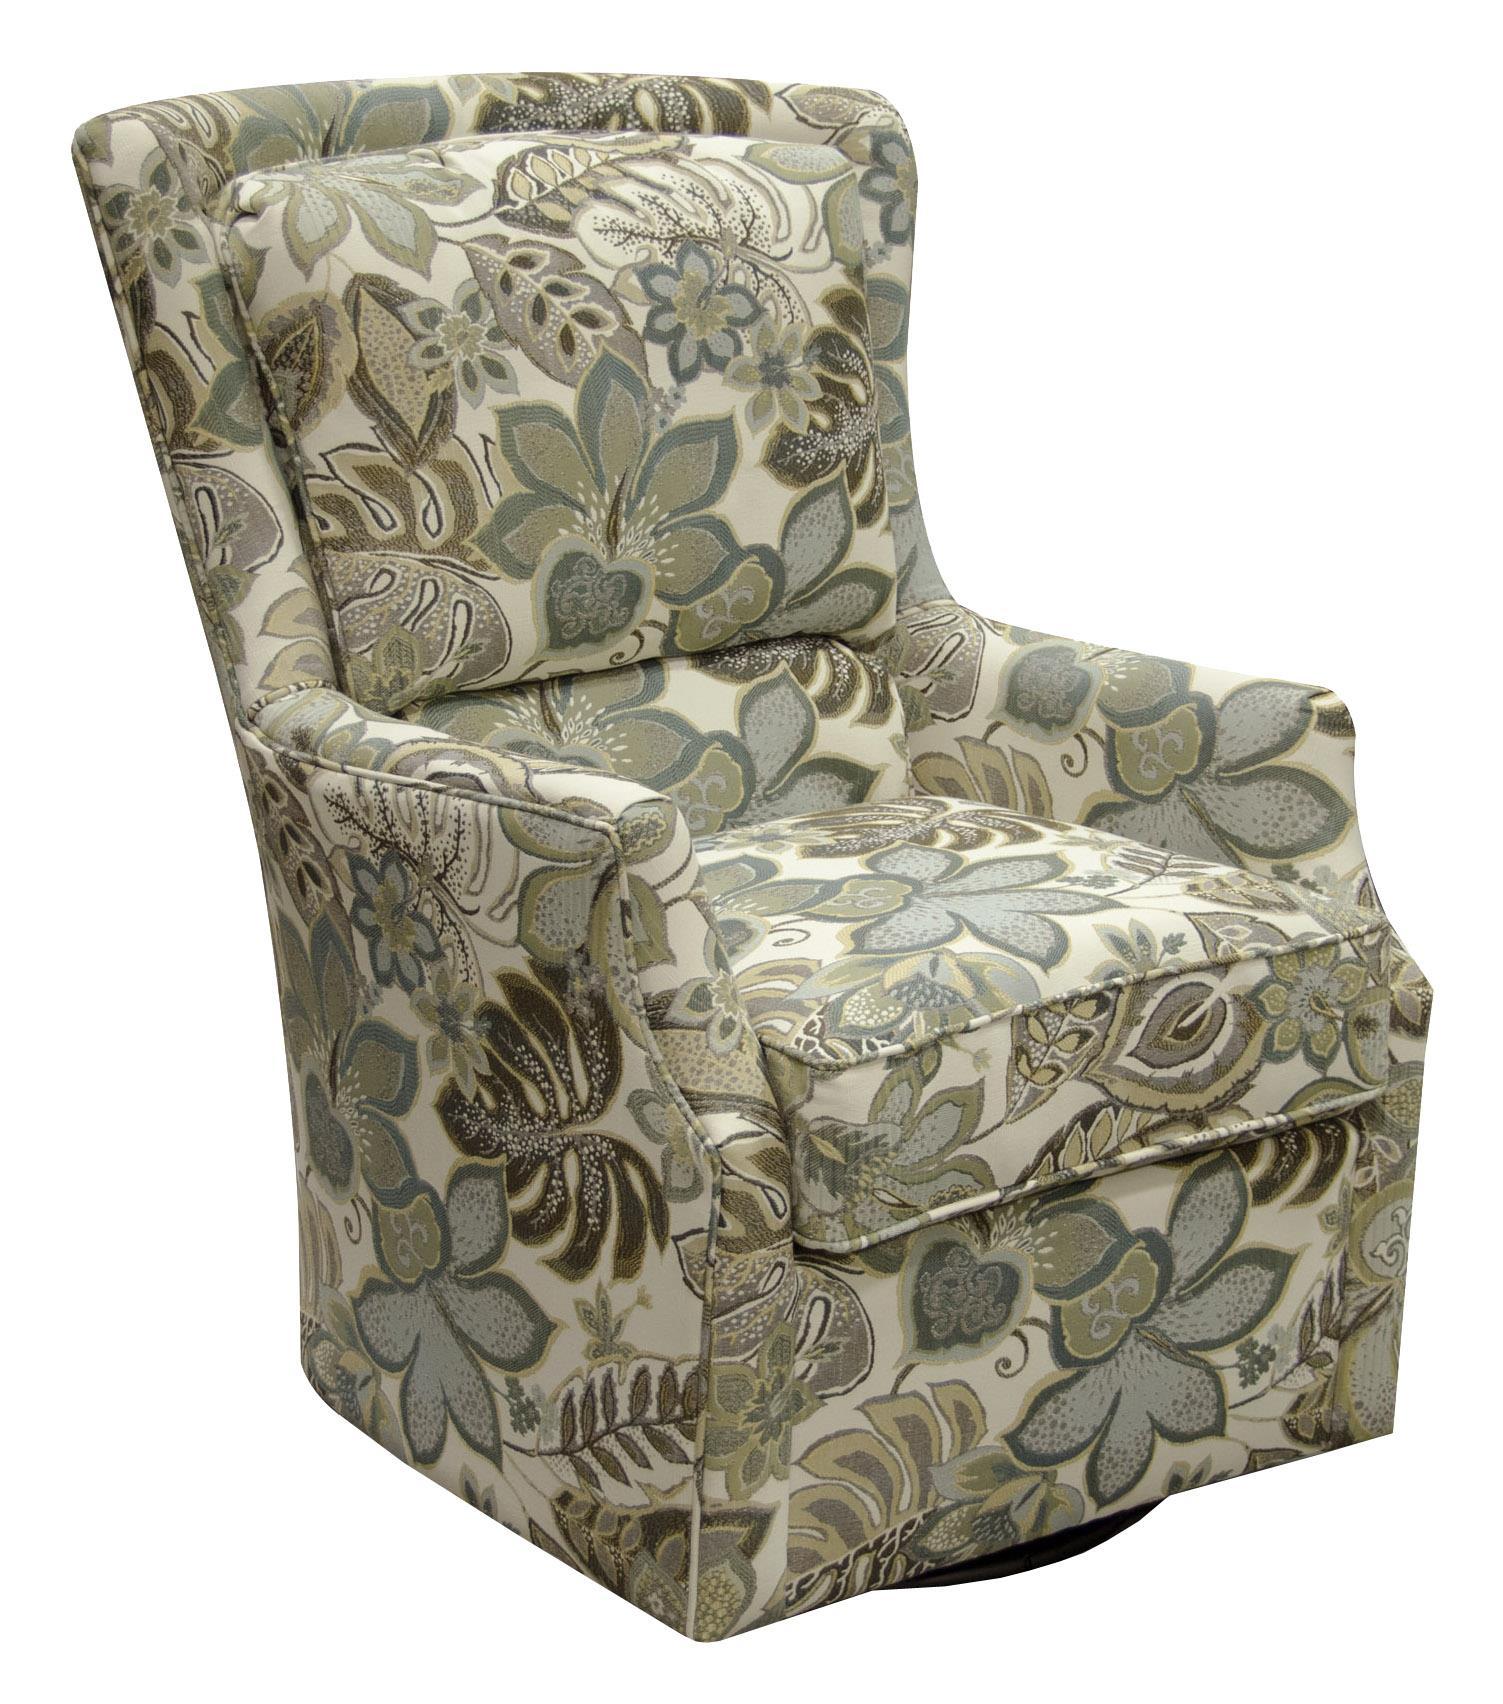 England Loren Chair - Item Number: 2910-69-6942